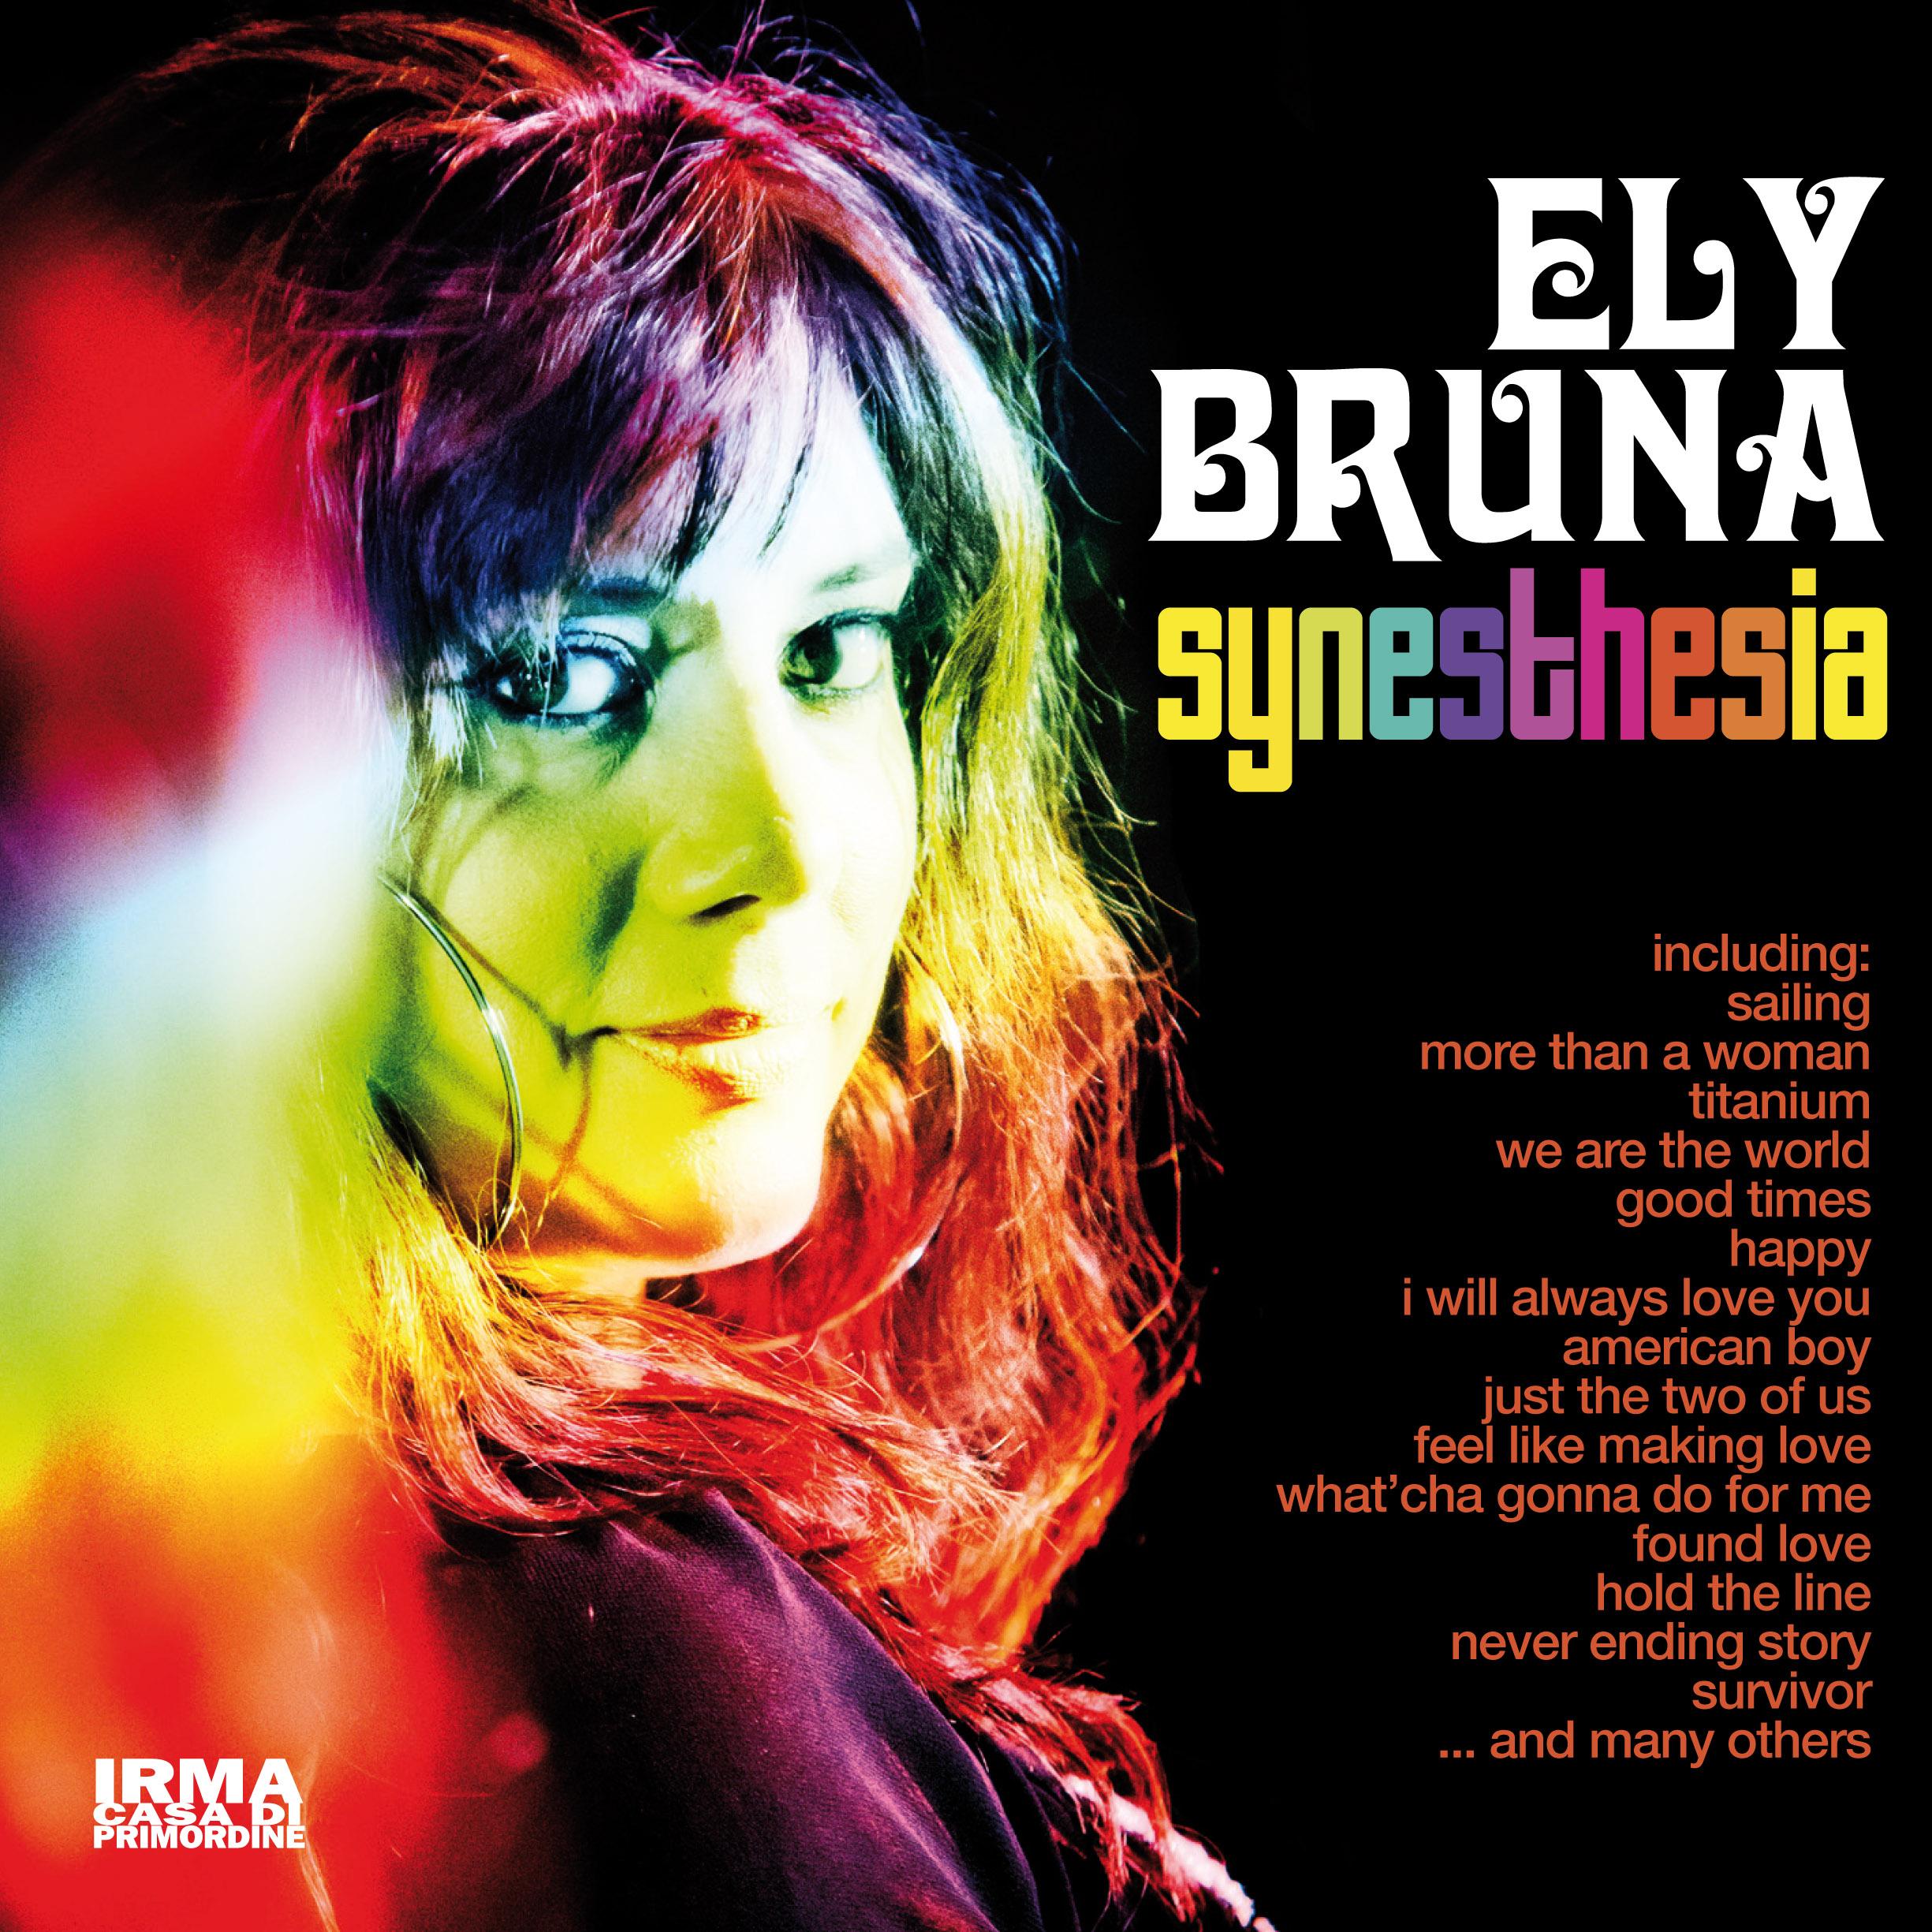 Ely Bruna - Synesthesia